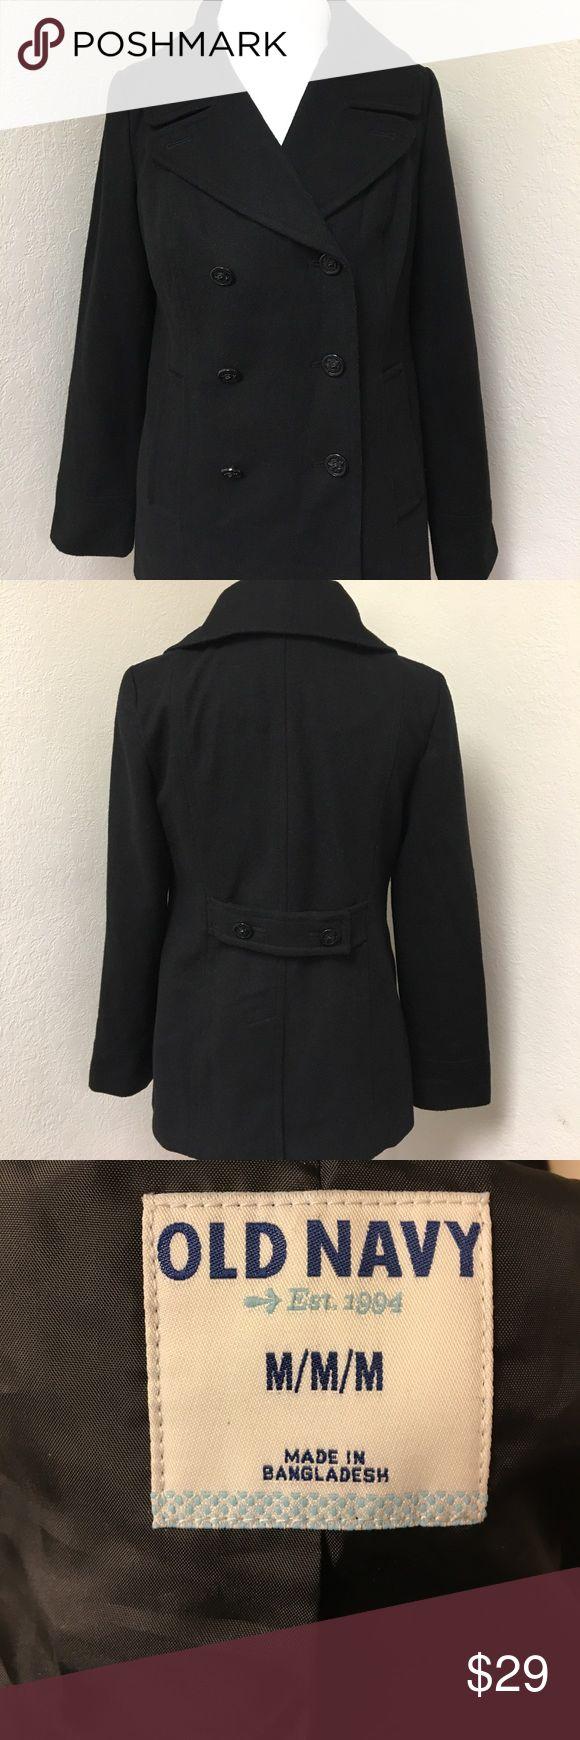 Black Old Navy Pea Coat Like new! Casual, black, Old Navy pea coat! Great condition. Item #51. Old Navy Jackets & Coats Pea Coats